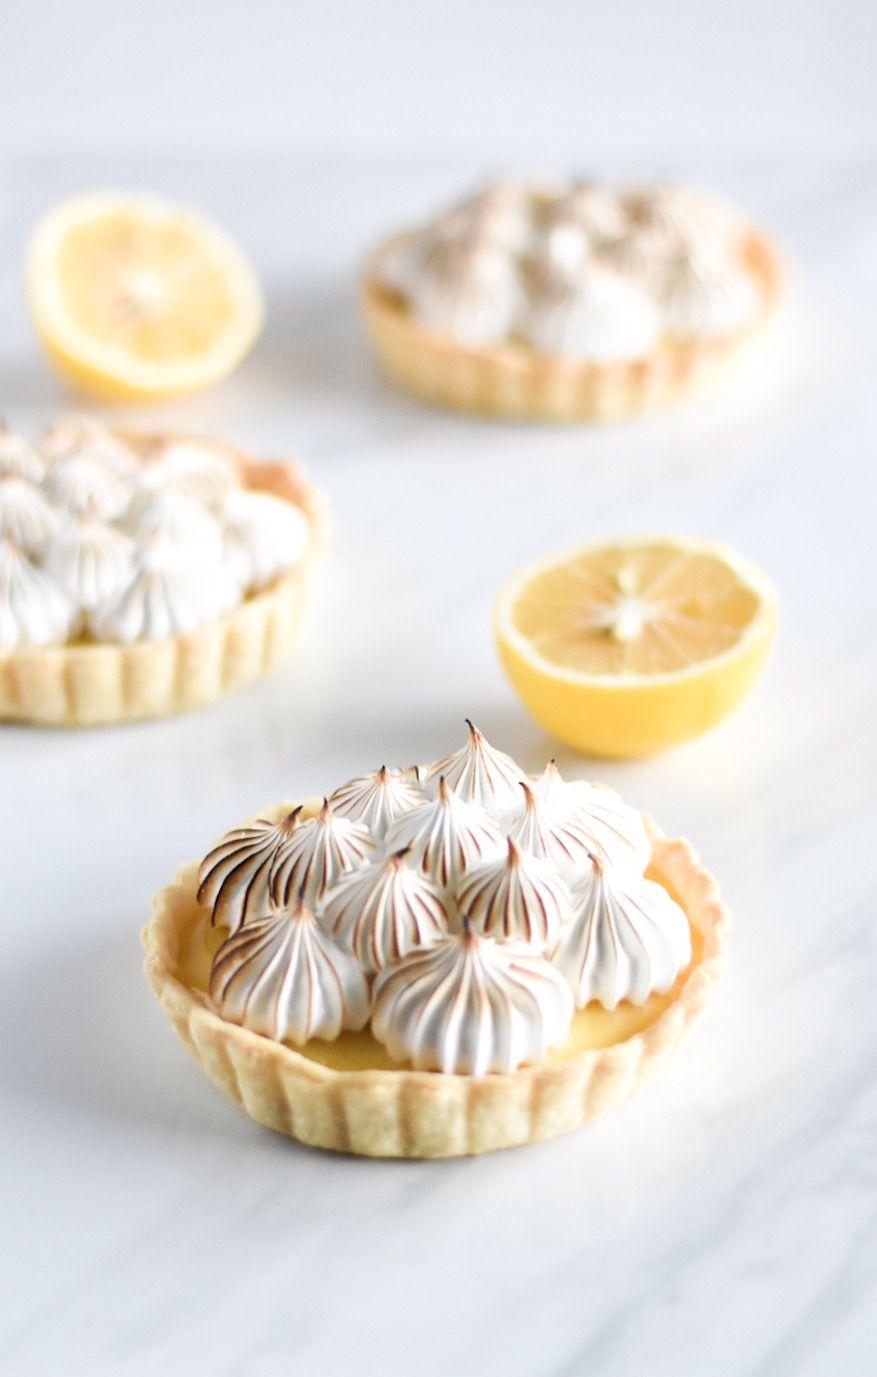 Lemon Meringue Tart #lemonmeringuepie